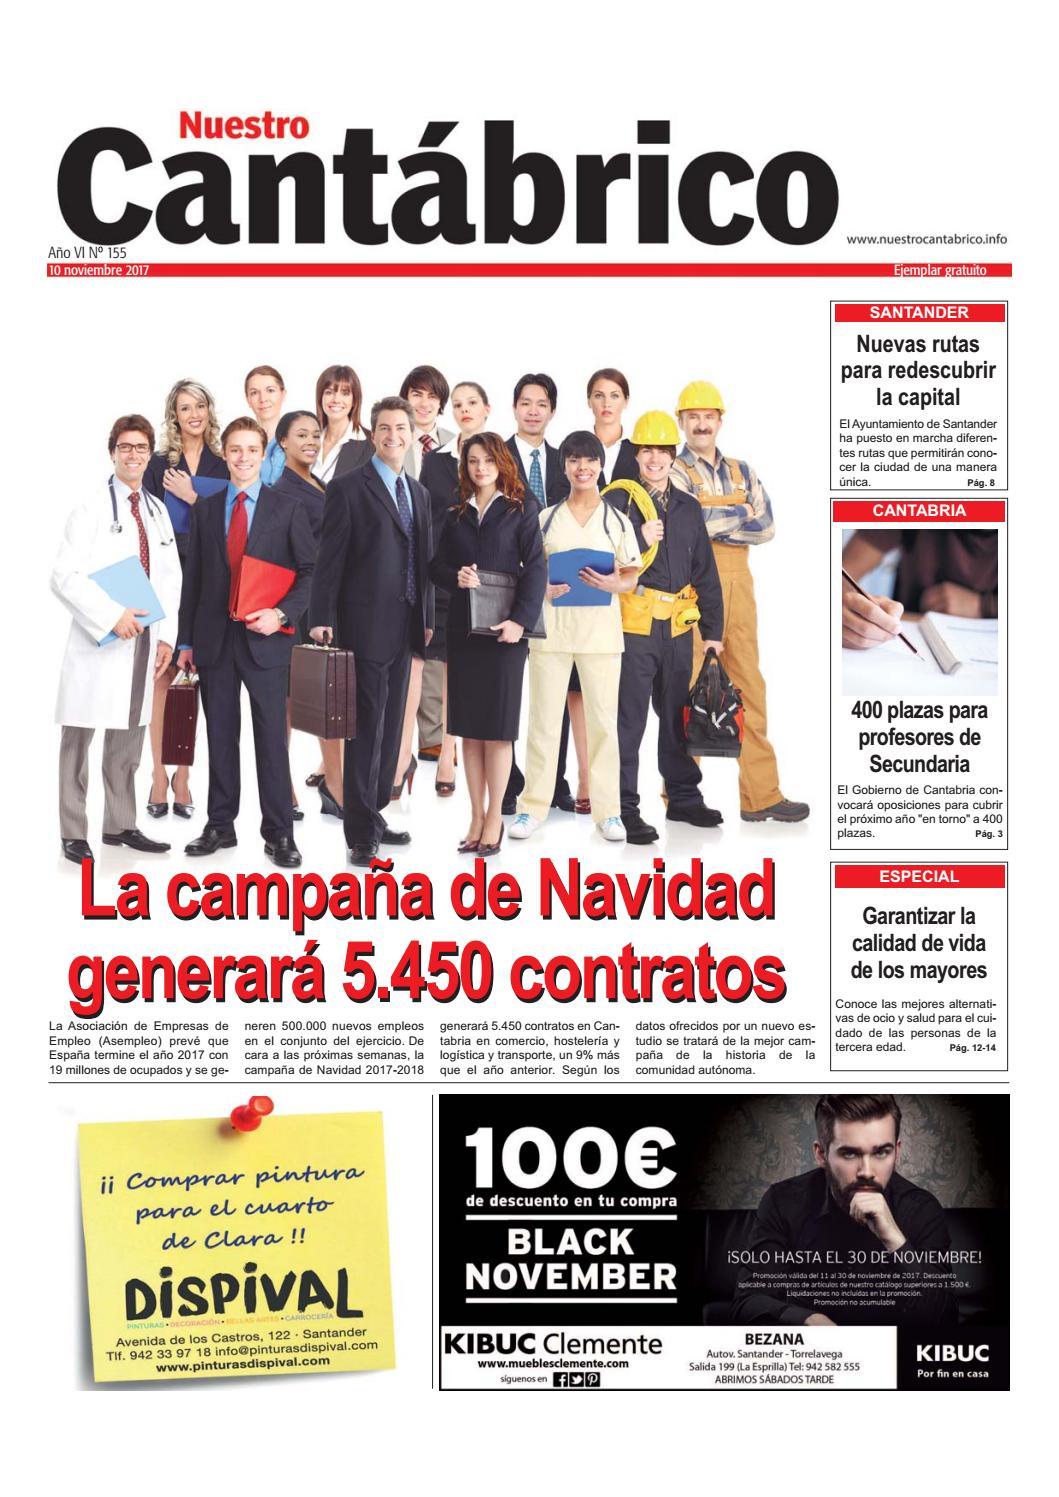 Nuestro Cantábrico 155 by Nuestro Cantábrico - issuu 22e84bbe9d254